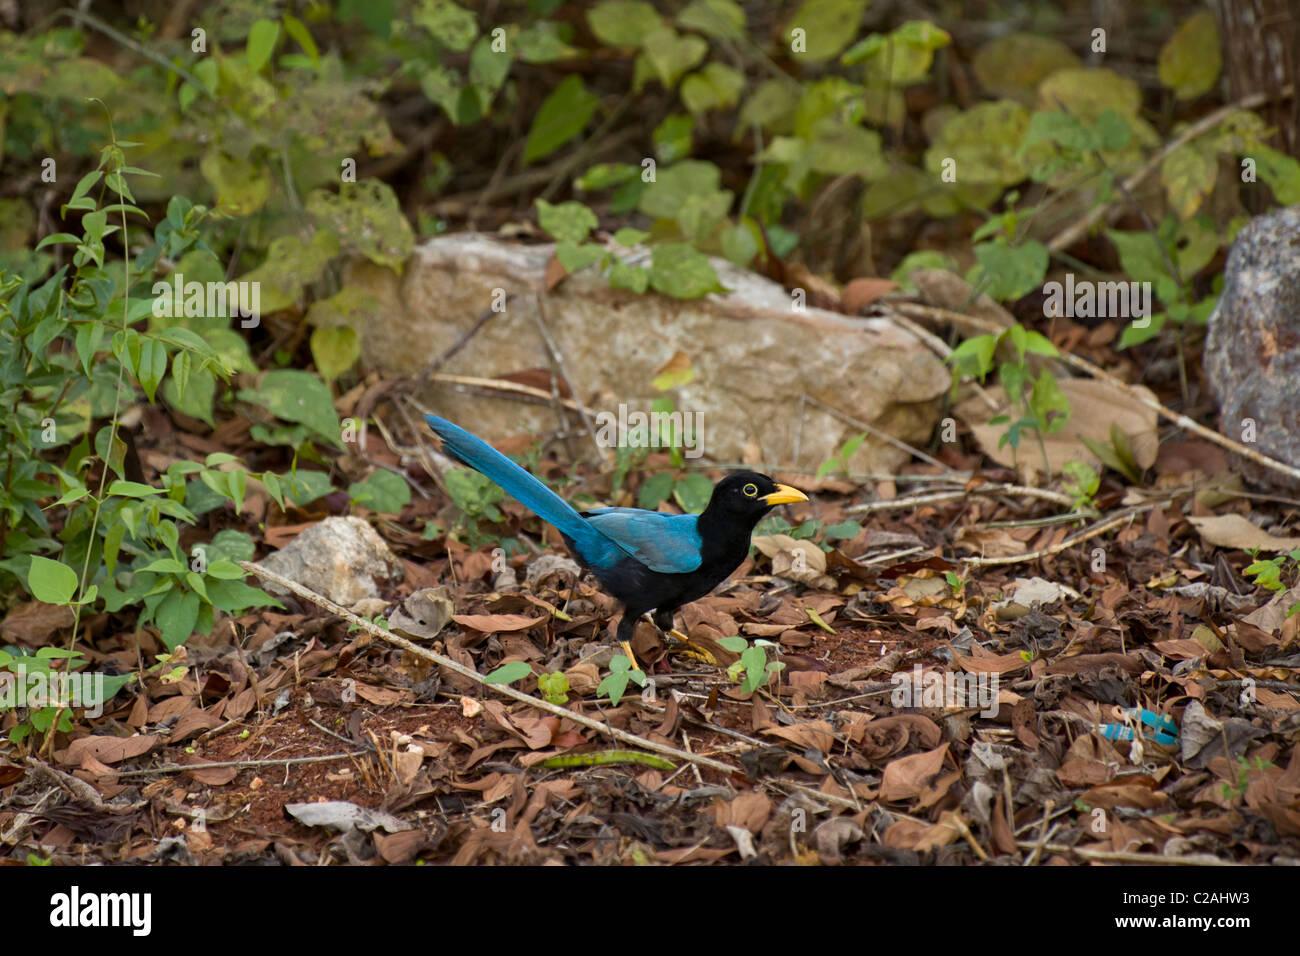 Yucatan Jay (Cyanocorax Yucatanicus), Halbinsel Yucatan, Mexiko. Stockbild